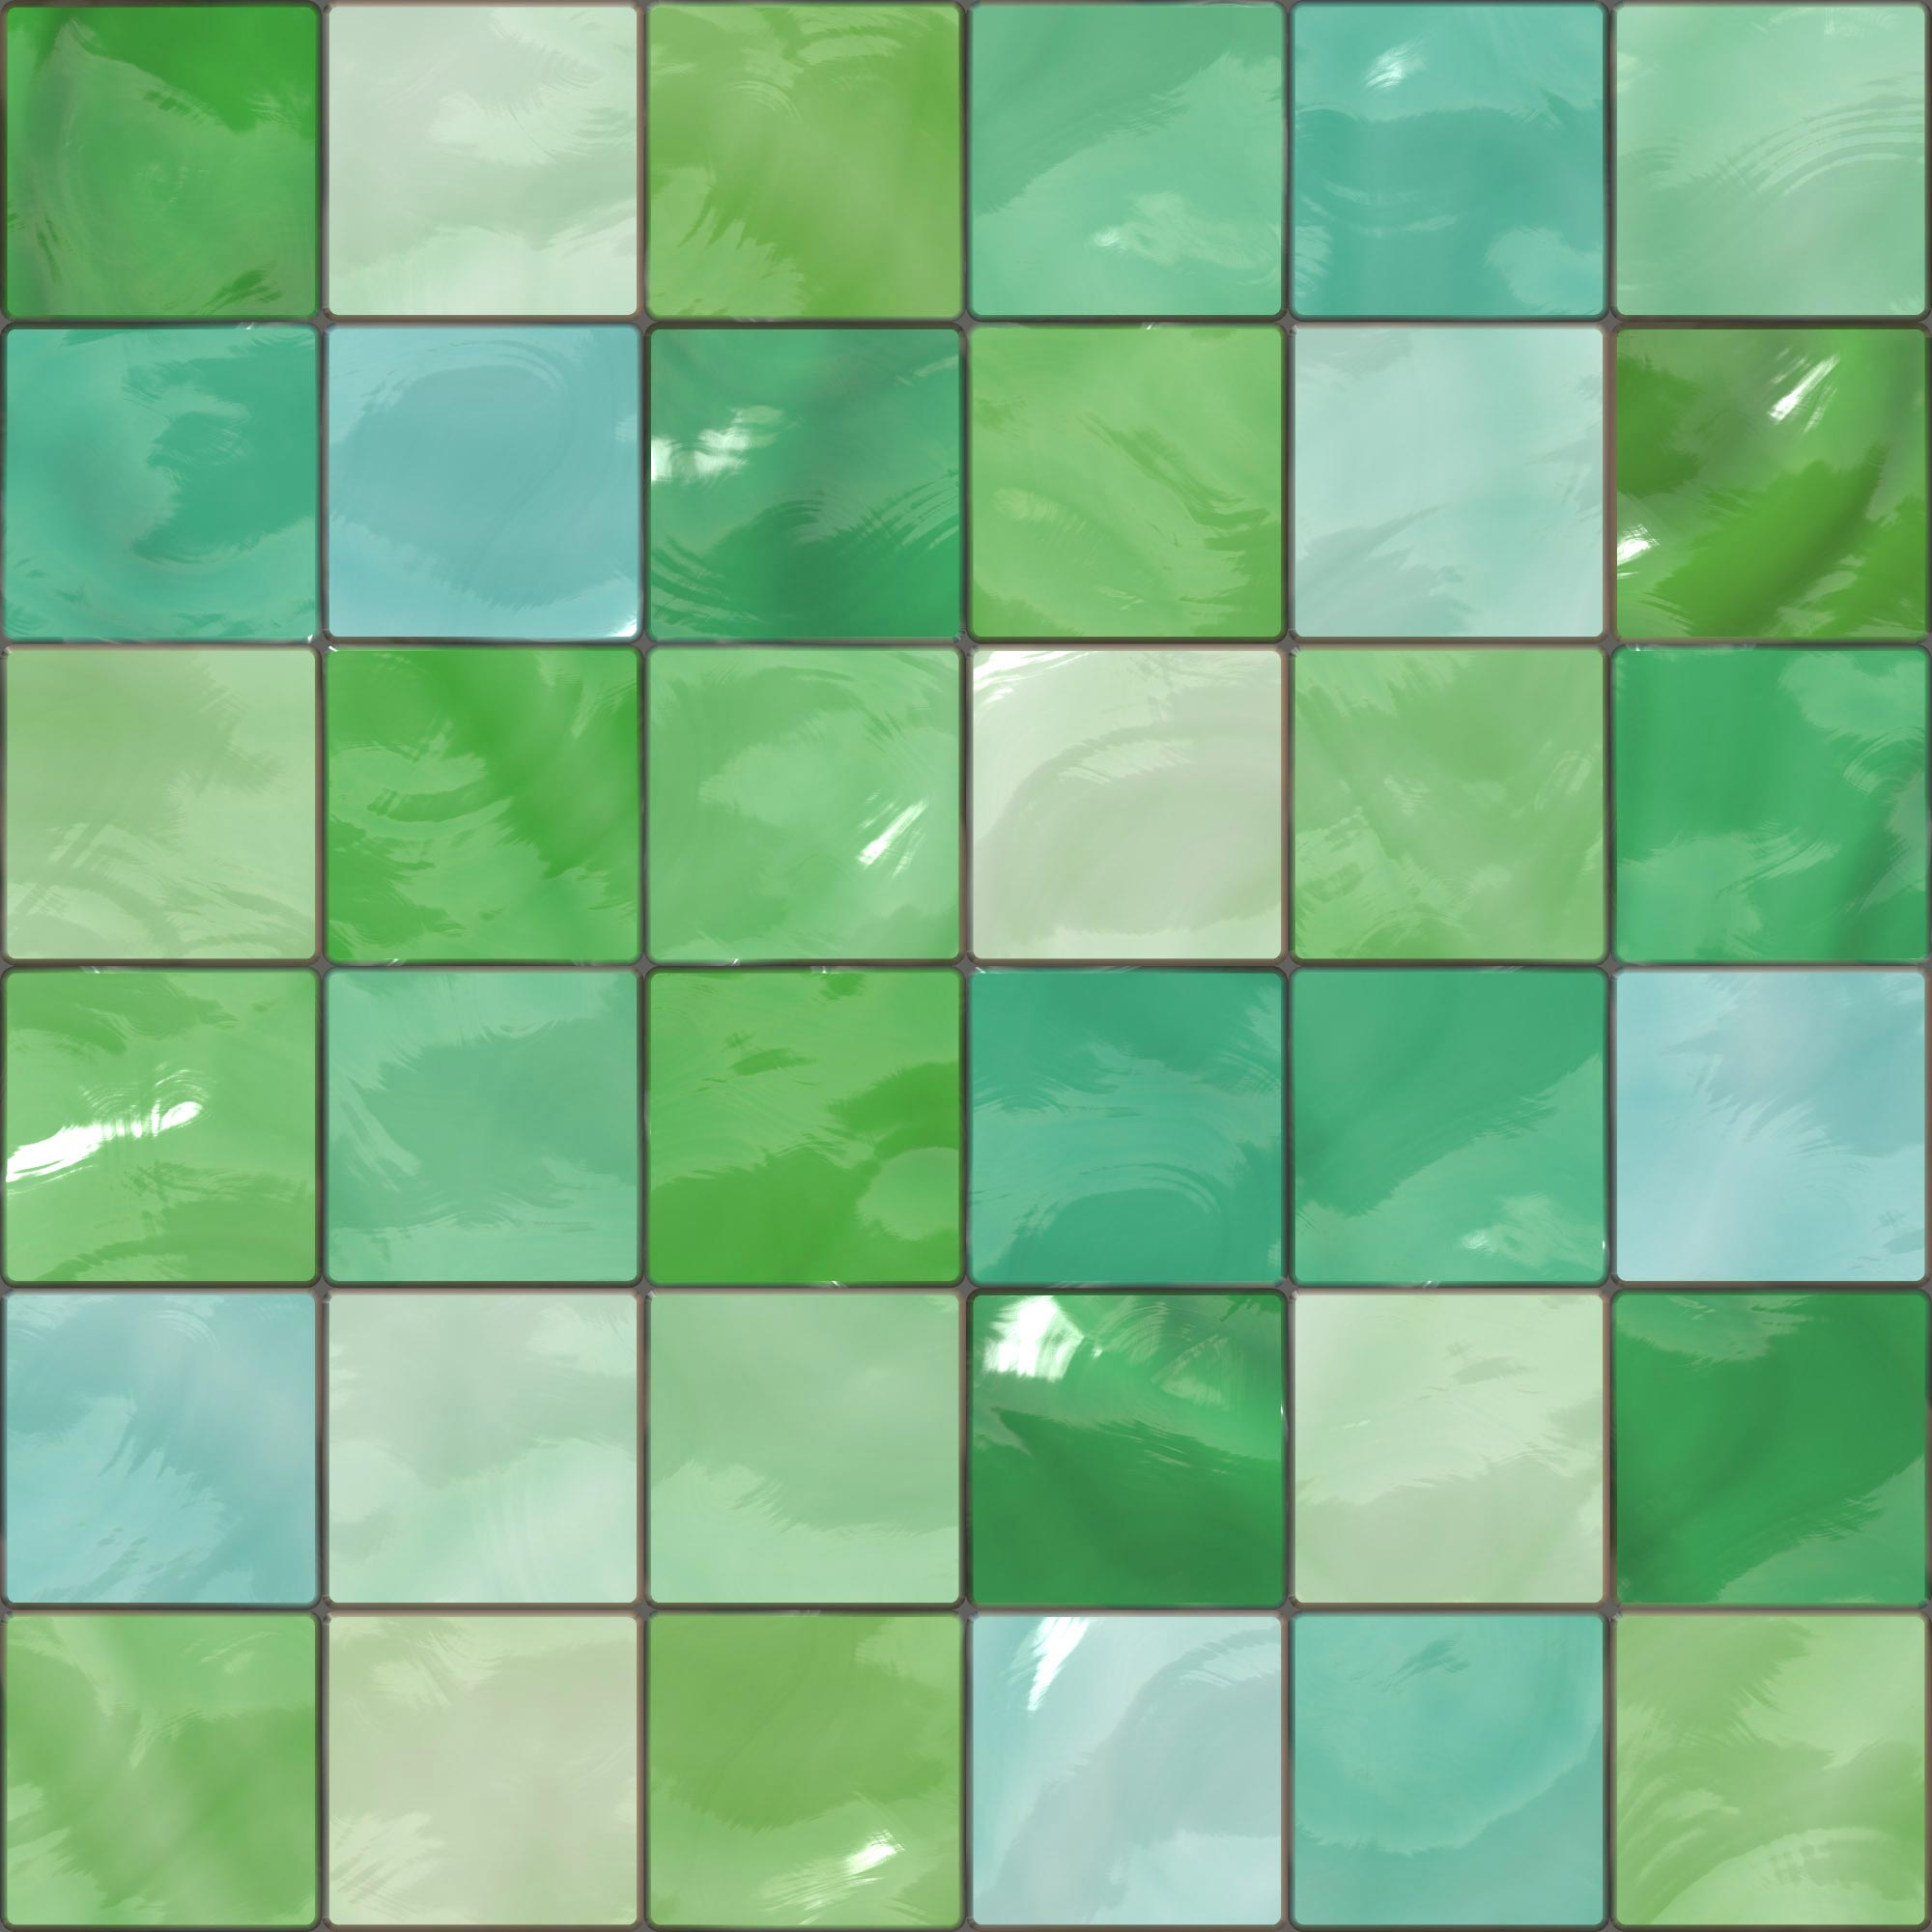 tiles_smaller